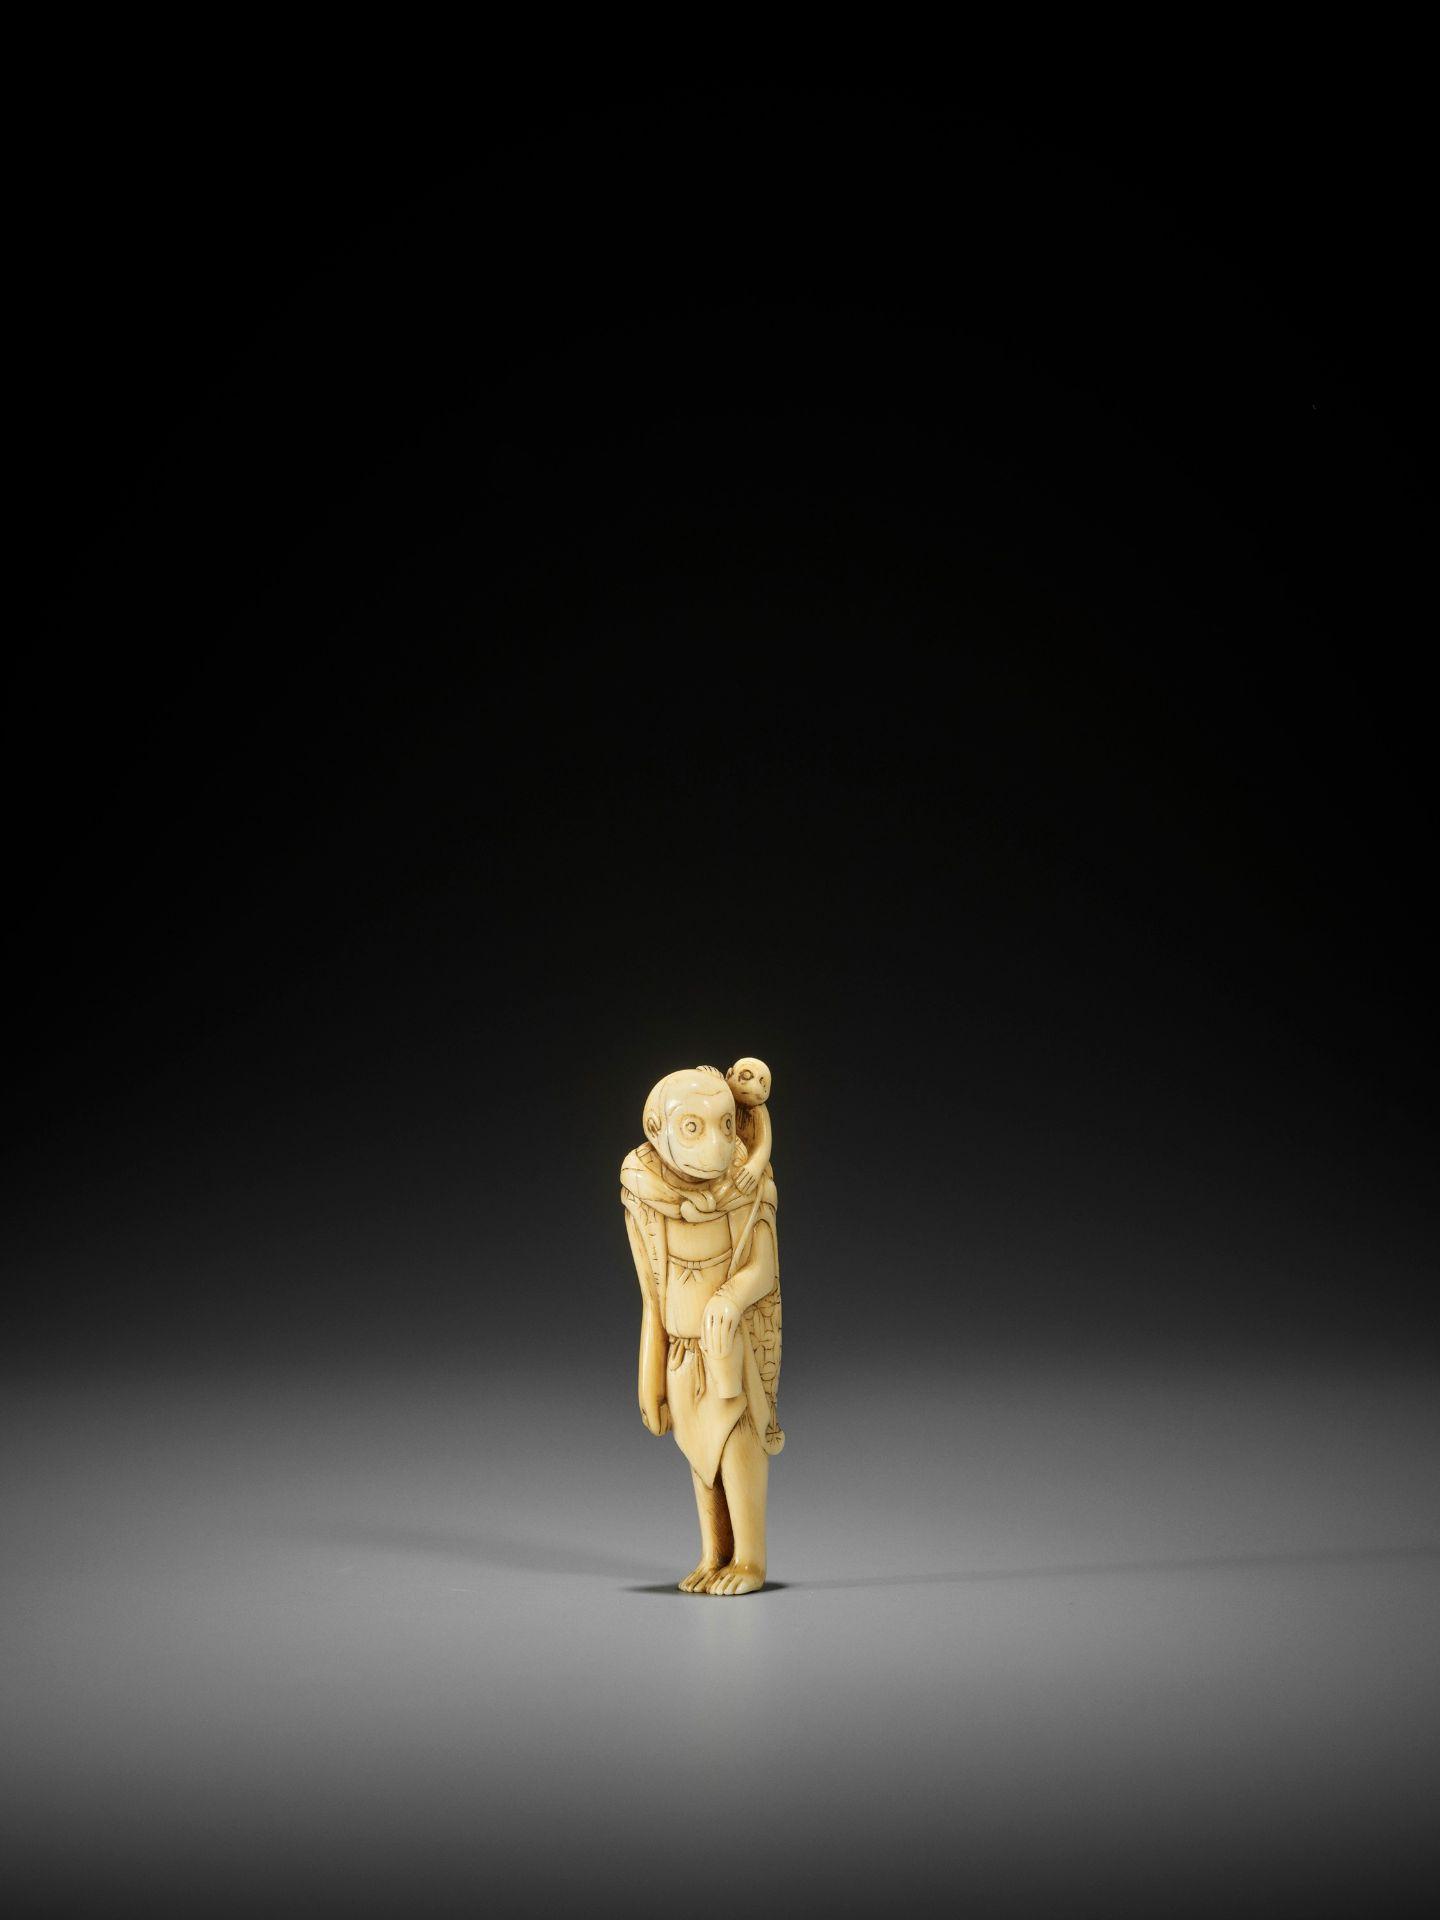 AN UNUSUAL AND EARLY IVORY NETSUKE OF A MONKEY AS A SARUMAWASHI - Image 3 of 3